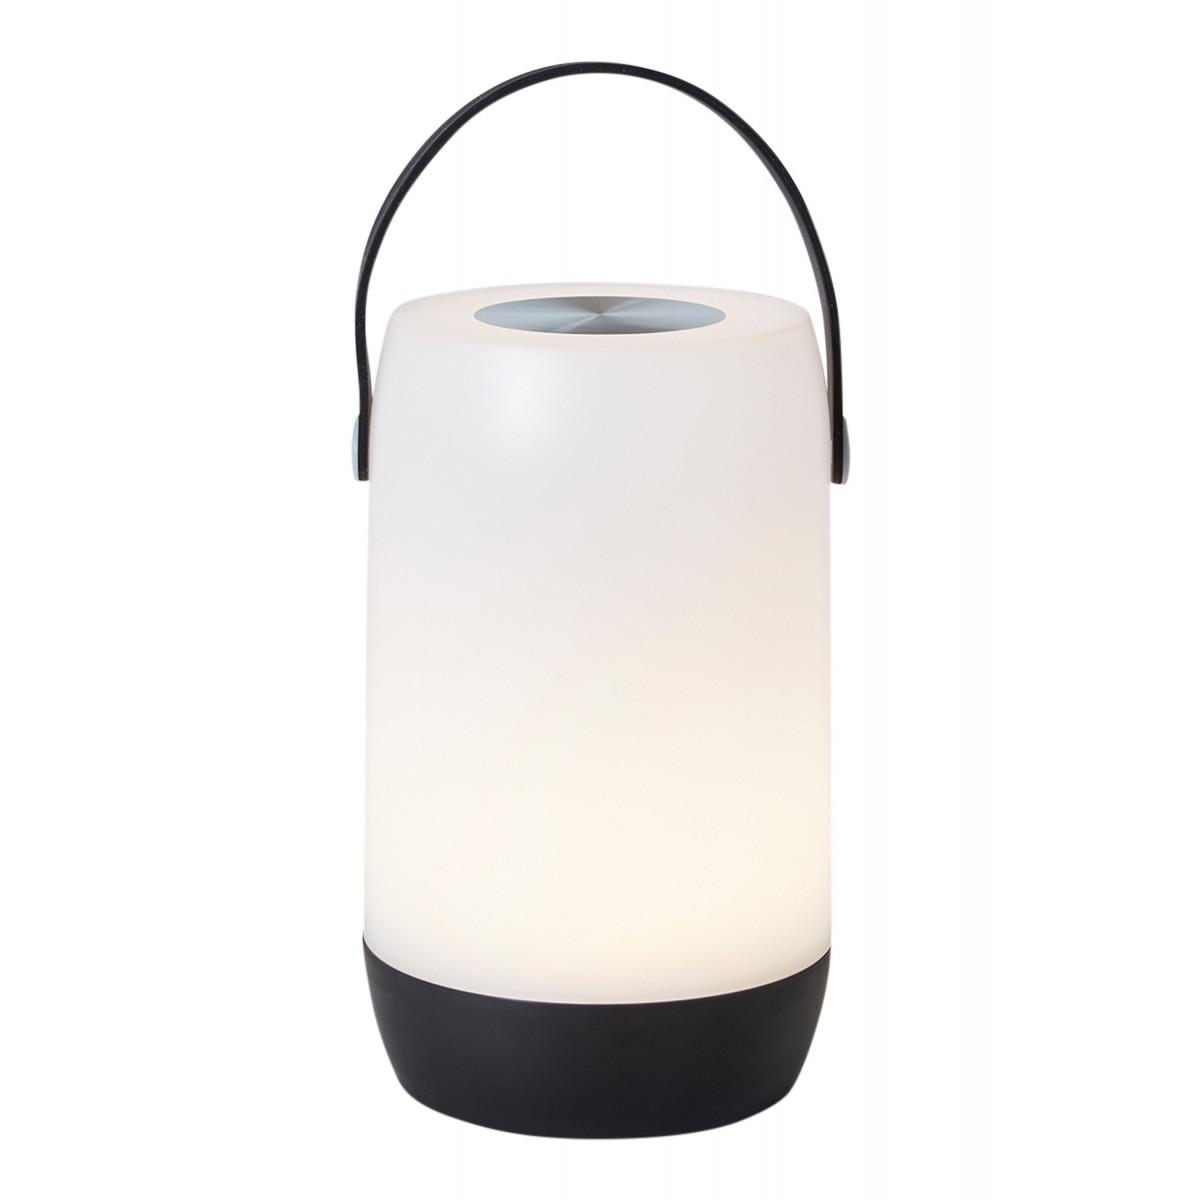 DACORE Lanterne LED touch